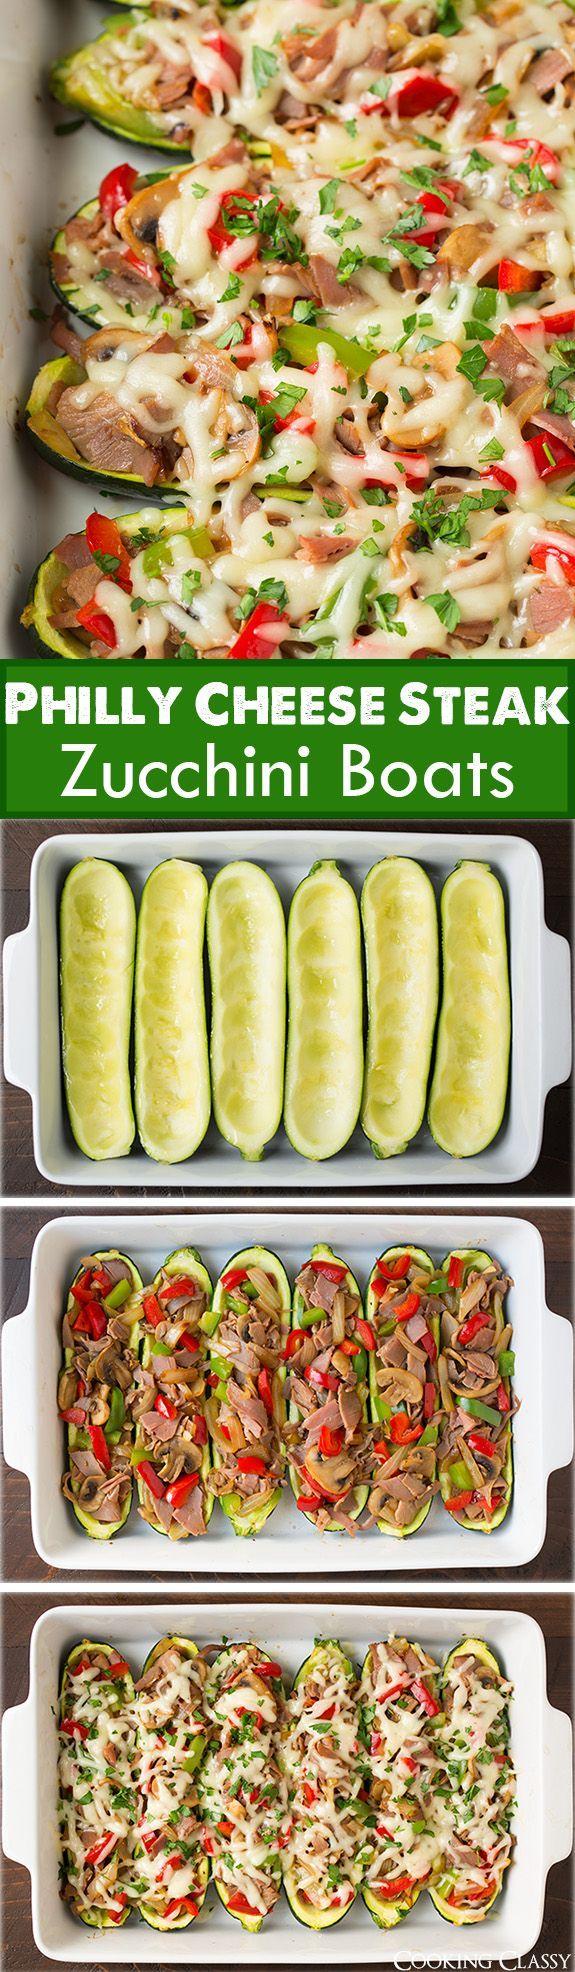 Philly Cheese Steak Zucchini Boats